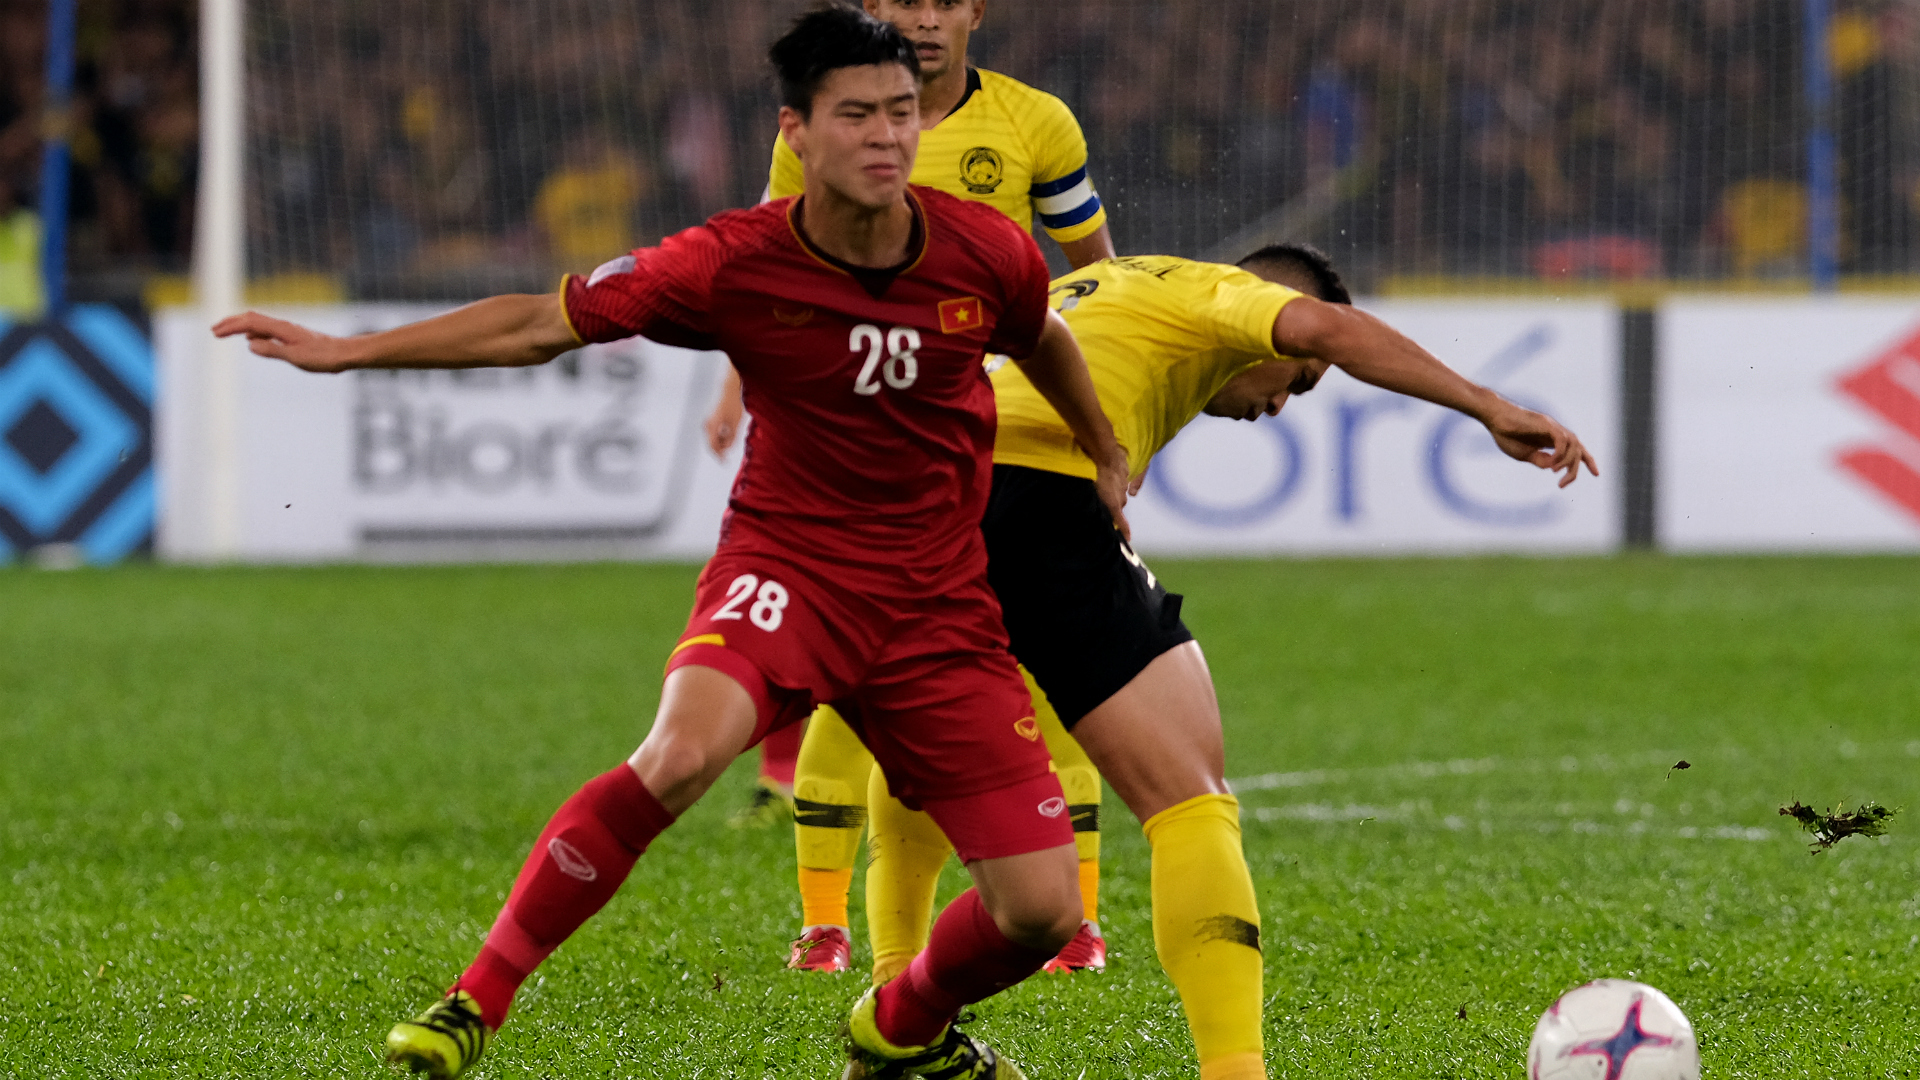 Norshahrul Idlan, Malaysia, 2018 AFF Suzuki Cup